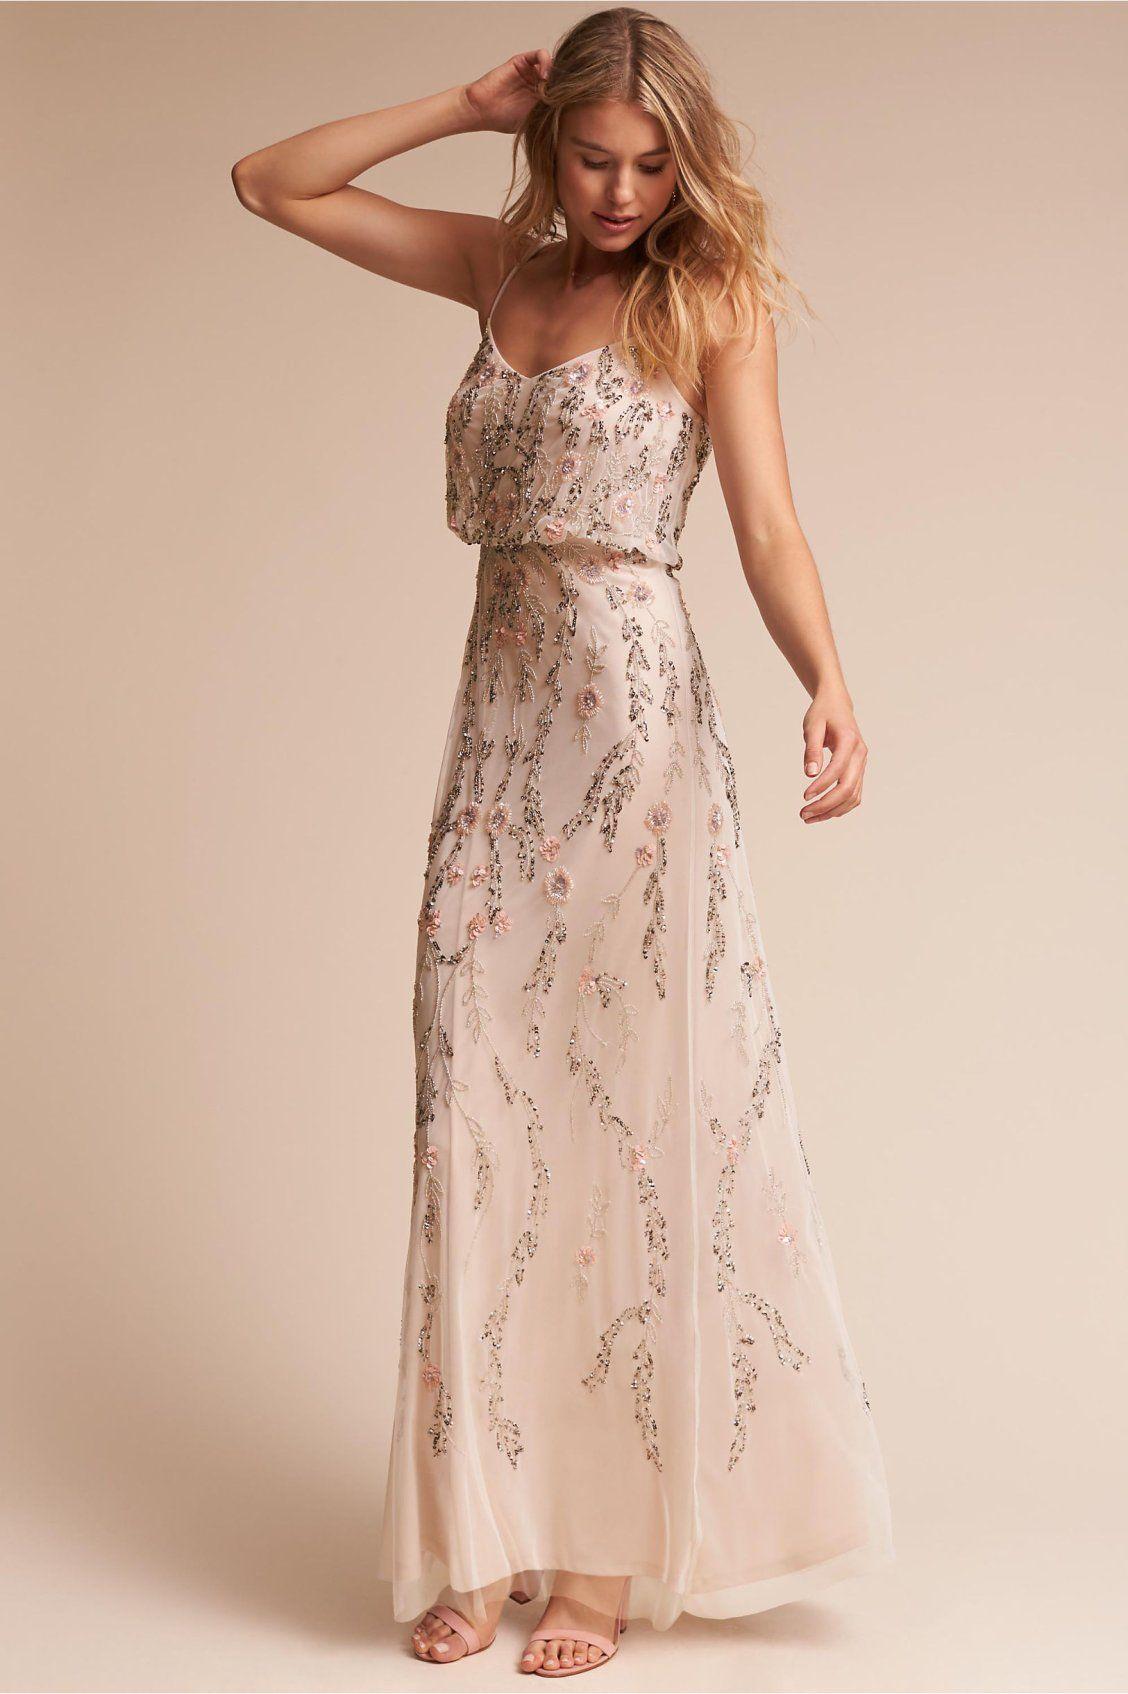 Tribute Dress from BHLDN  Trauzeugin kleid, Kleider mode